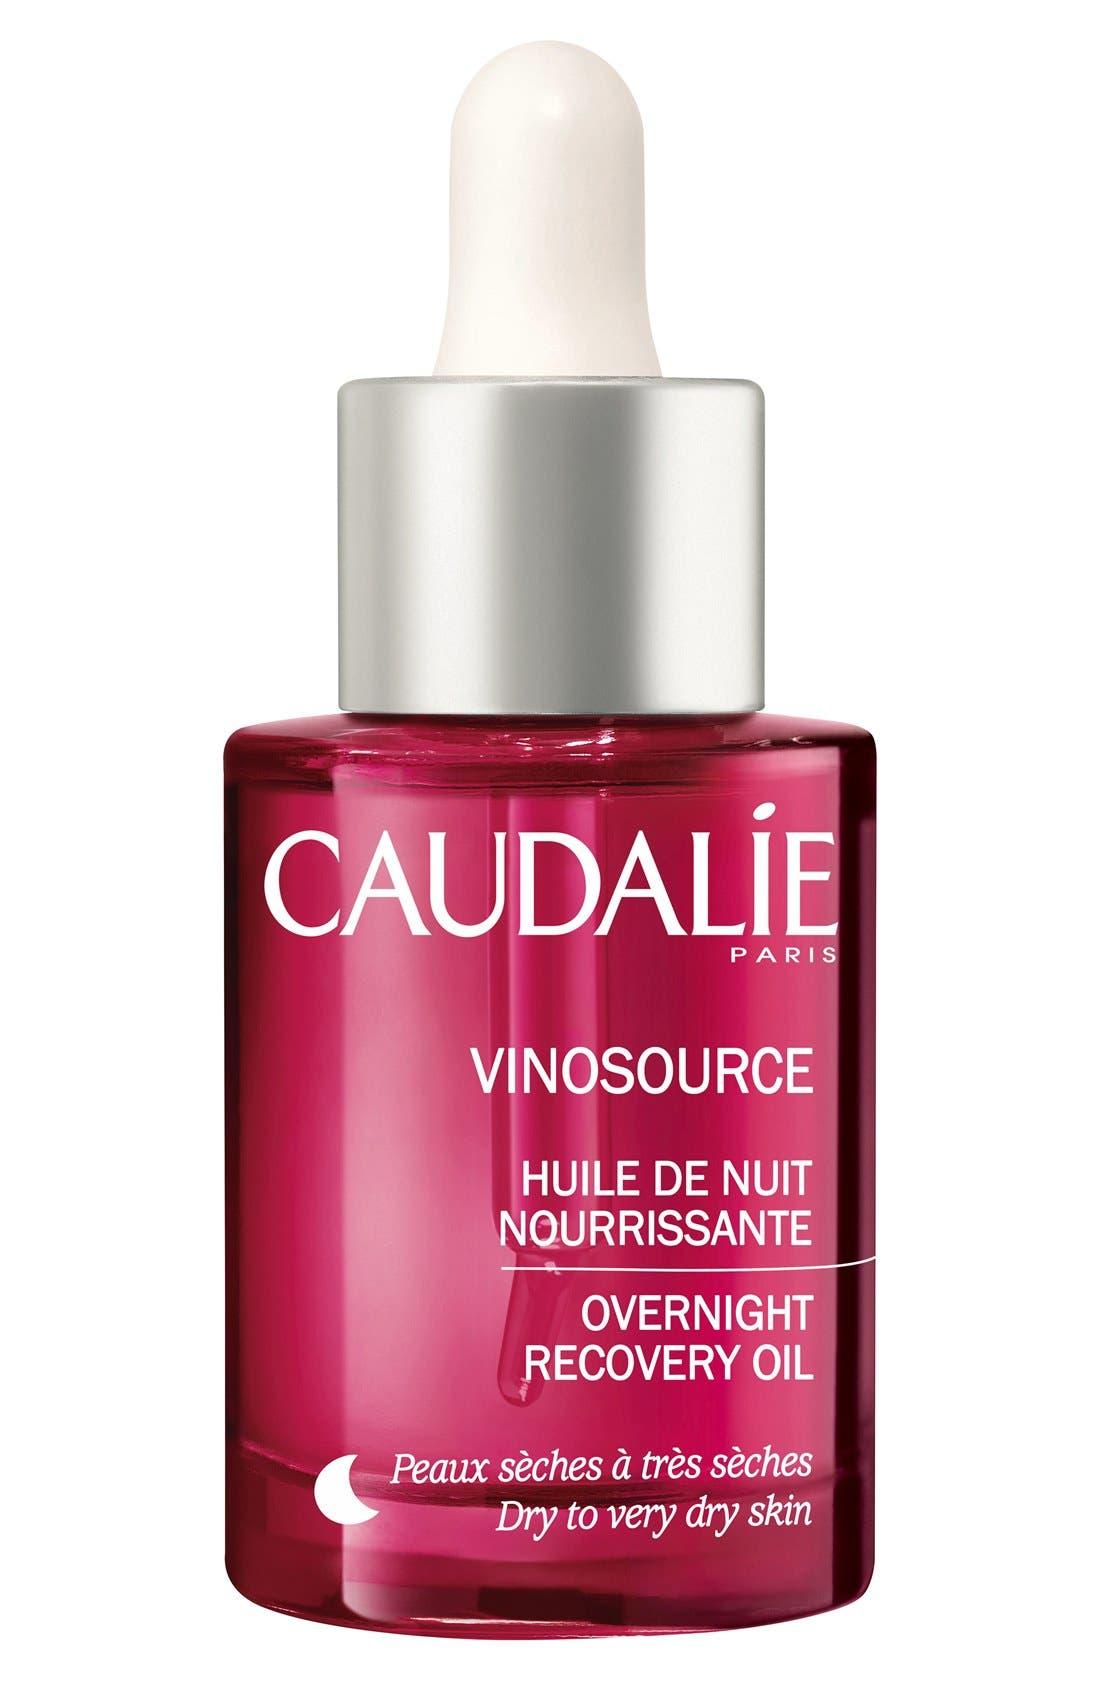 CAUDALÍE Vinosource Overnight Recovery Oil